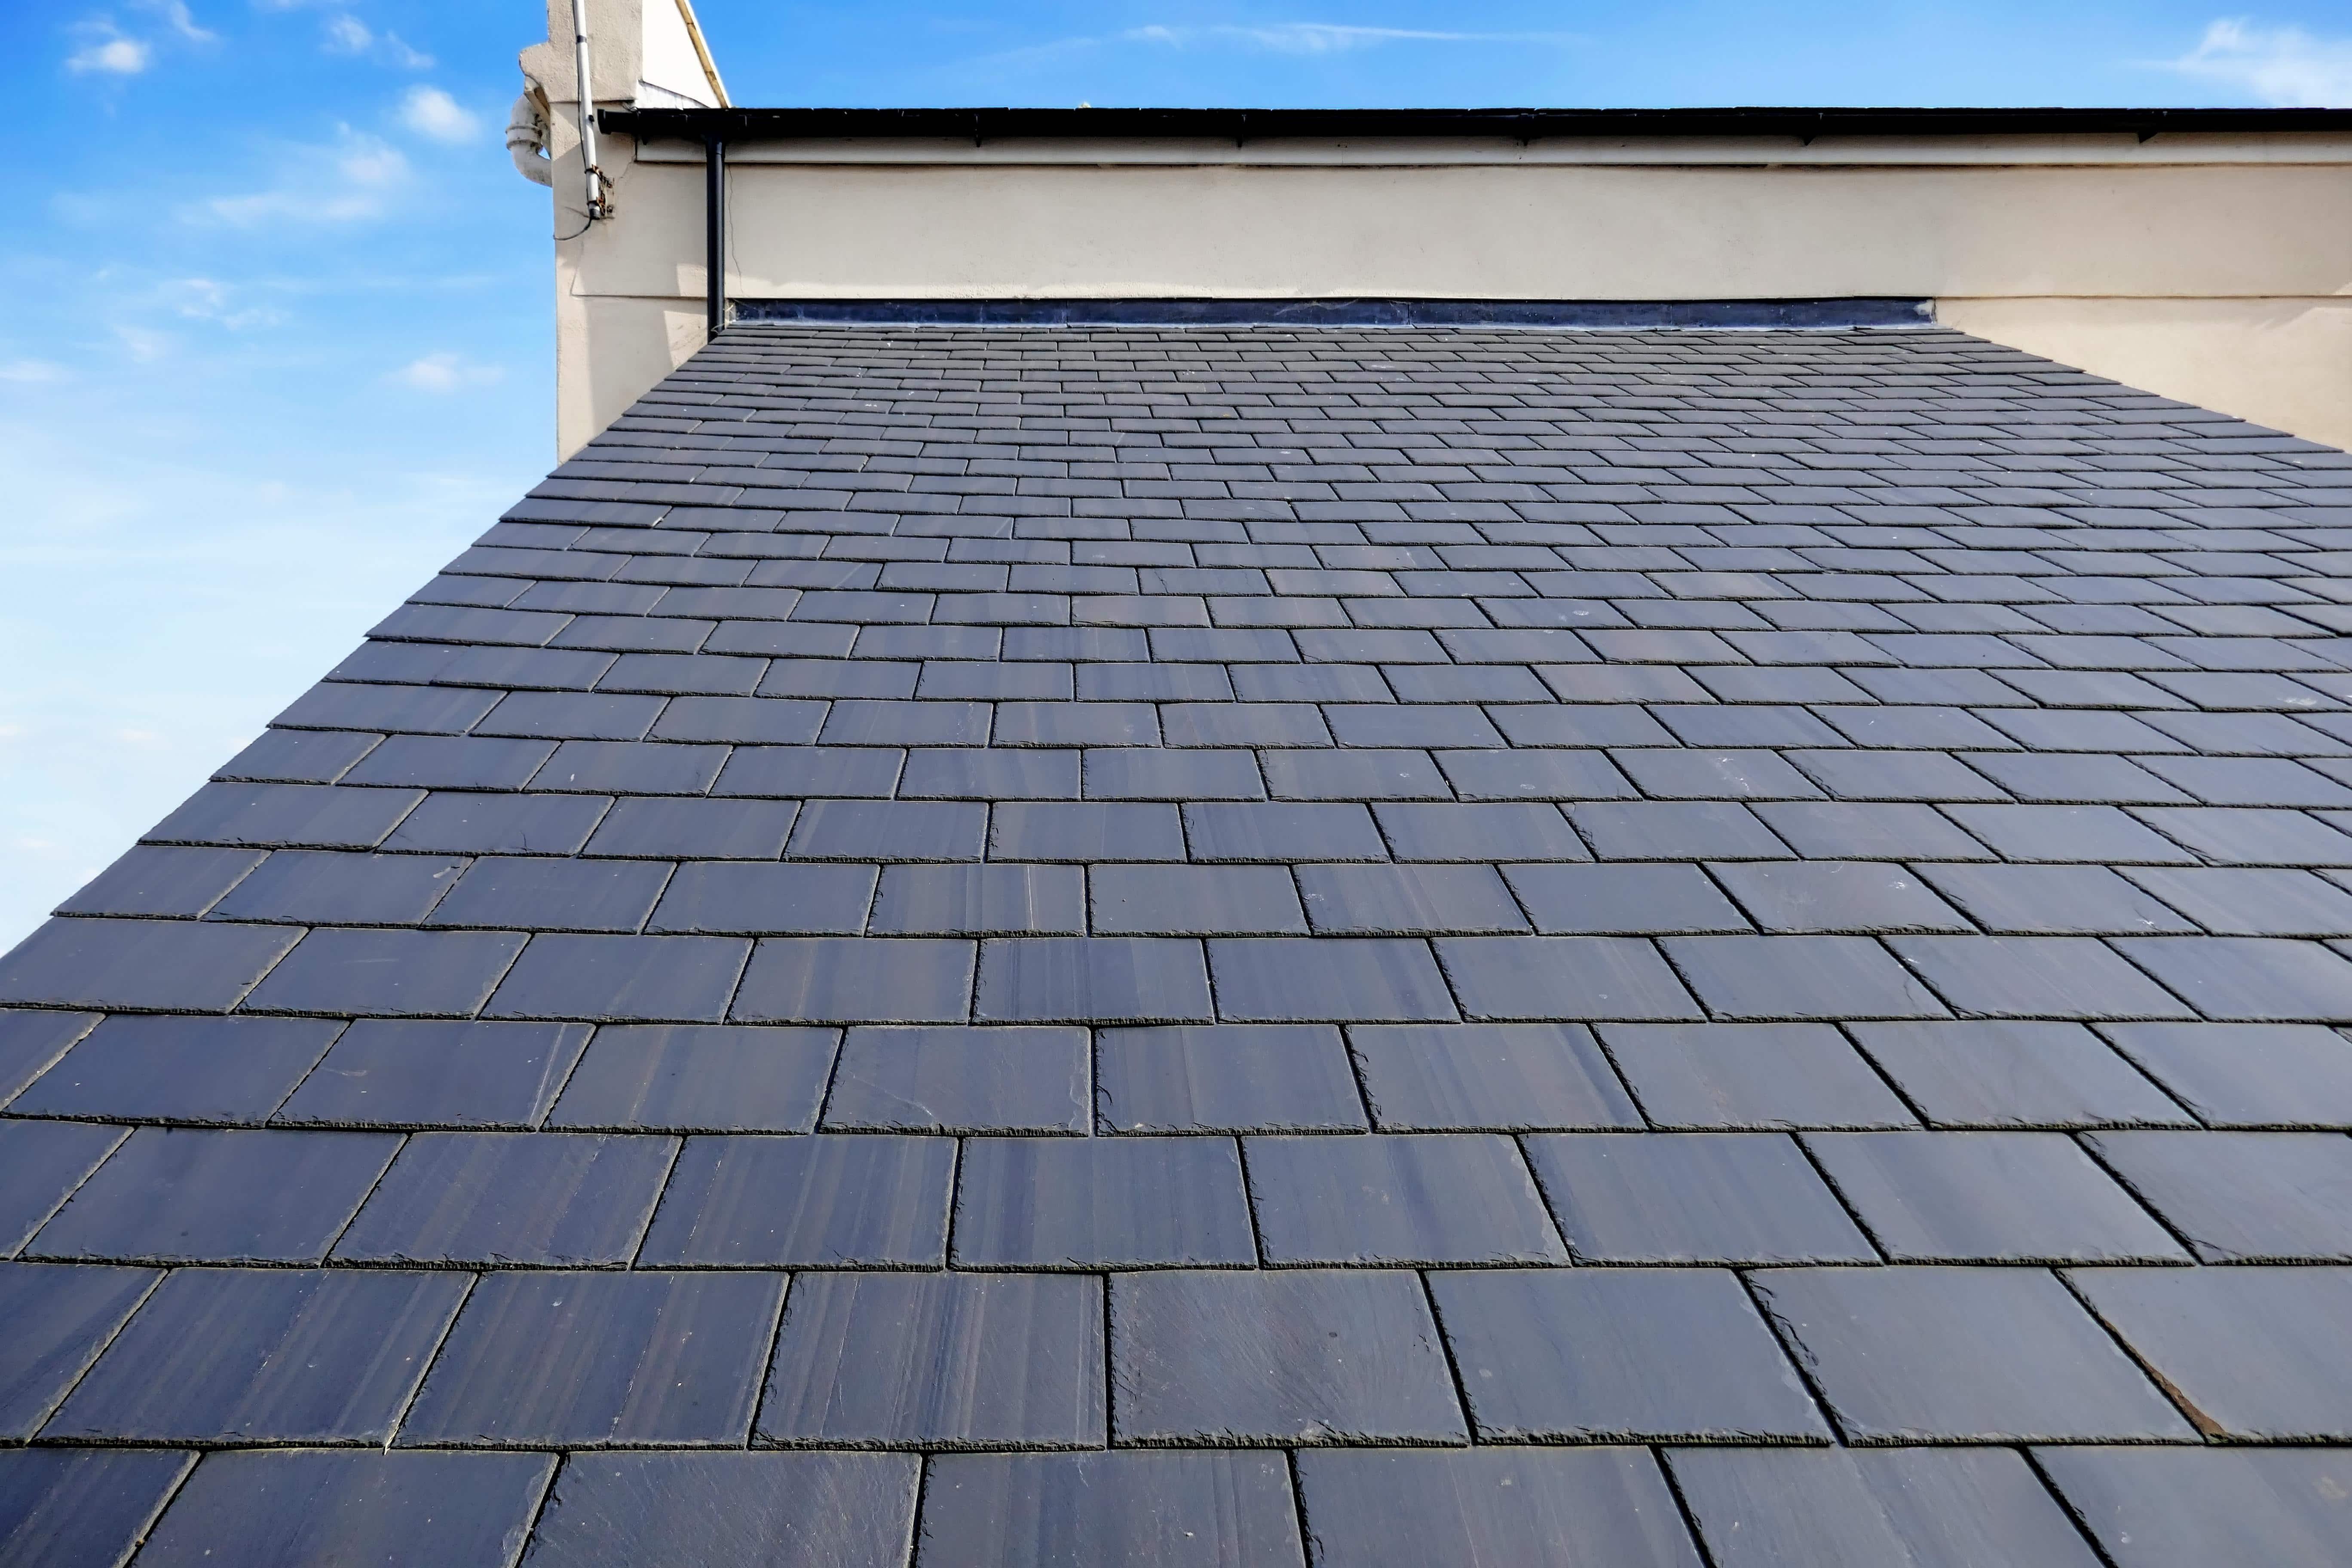 3 roof maintenance myths